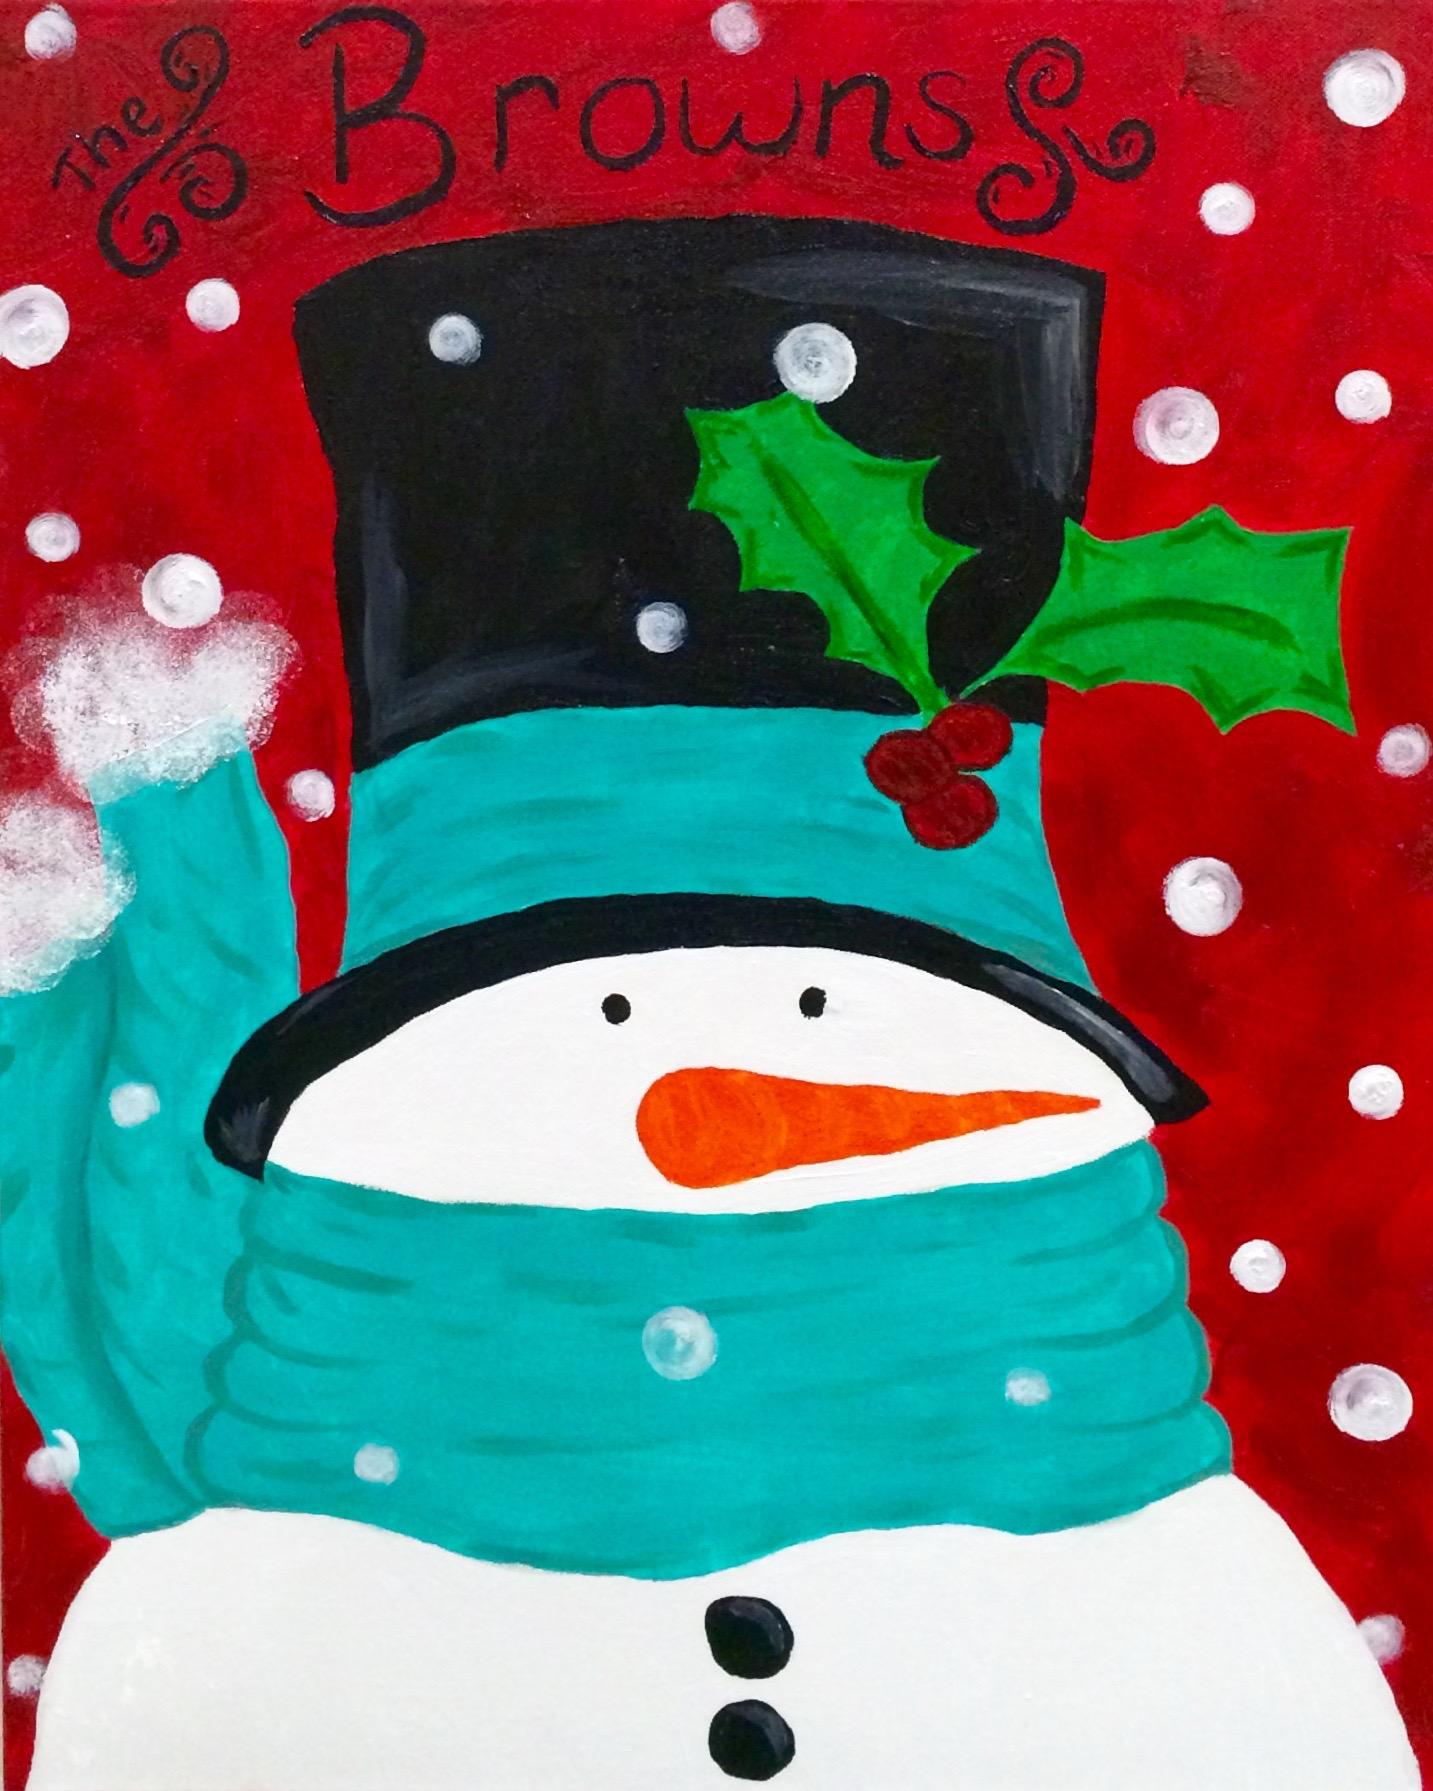 winter cozy snowman turquoise